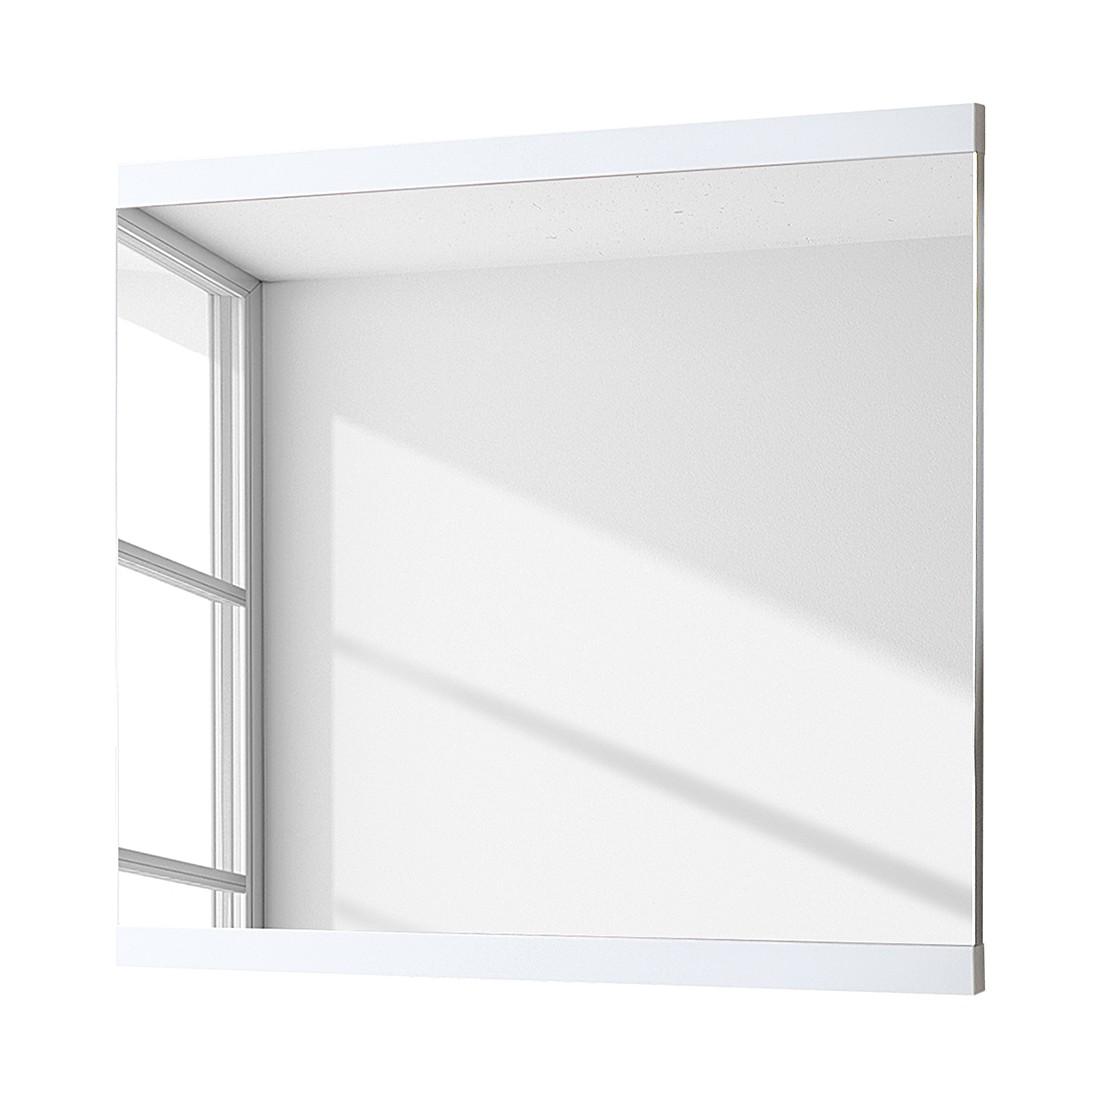 Miroir June II - Blanc brillant - 86 x 80 cm, Voss